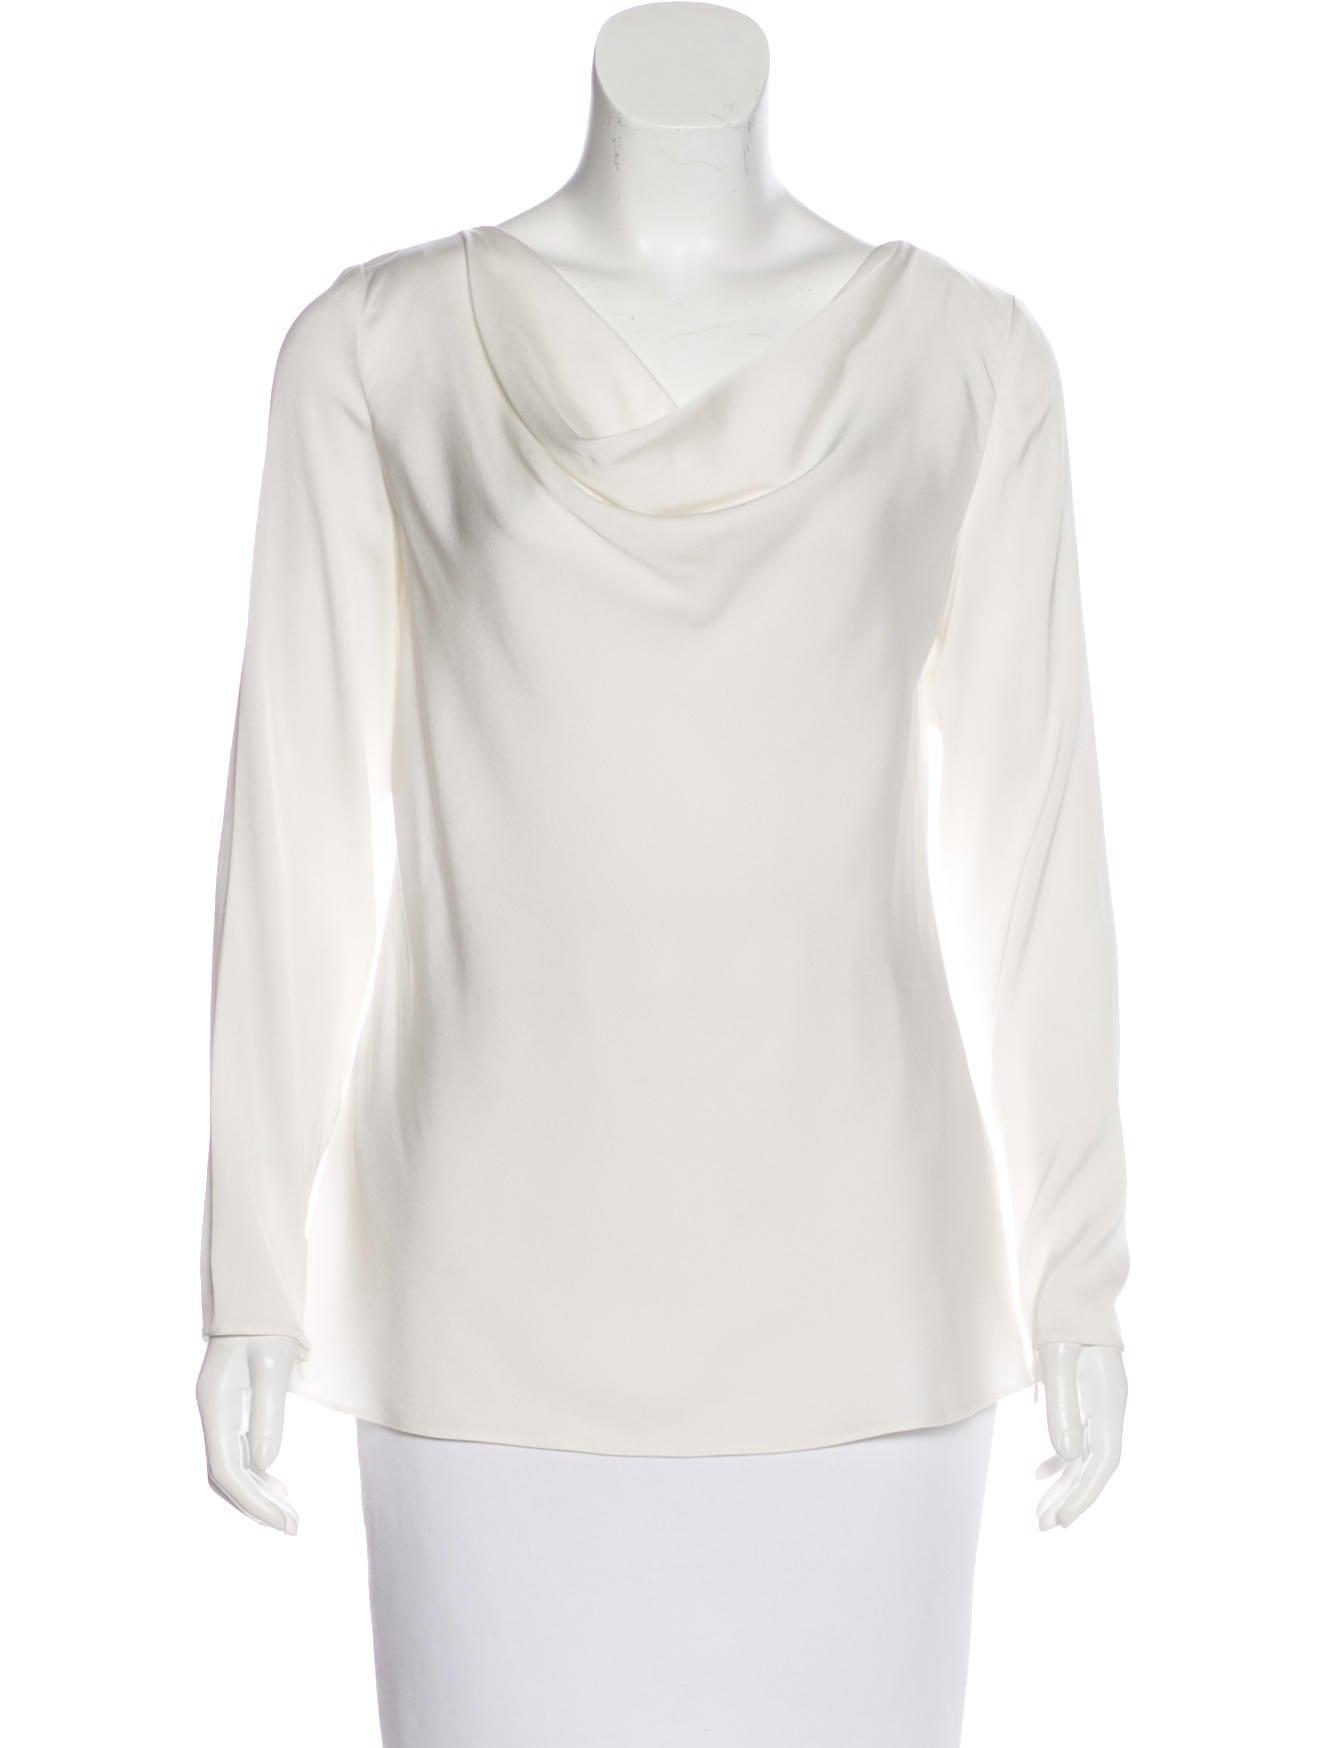 58218129 Armani Collezioni Silk Long Sleeve Blouse w/ Tags - Clothing ...